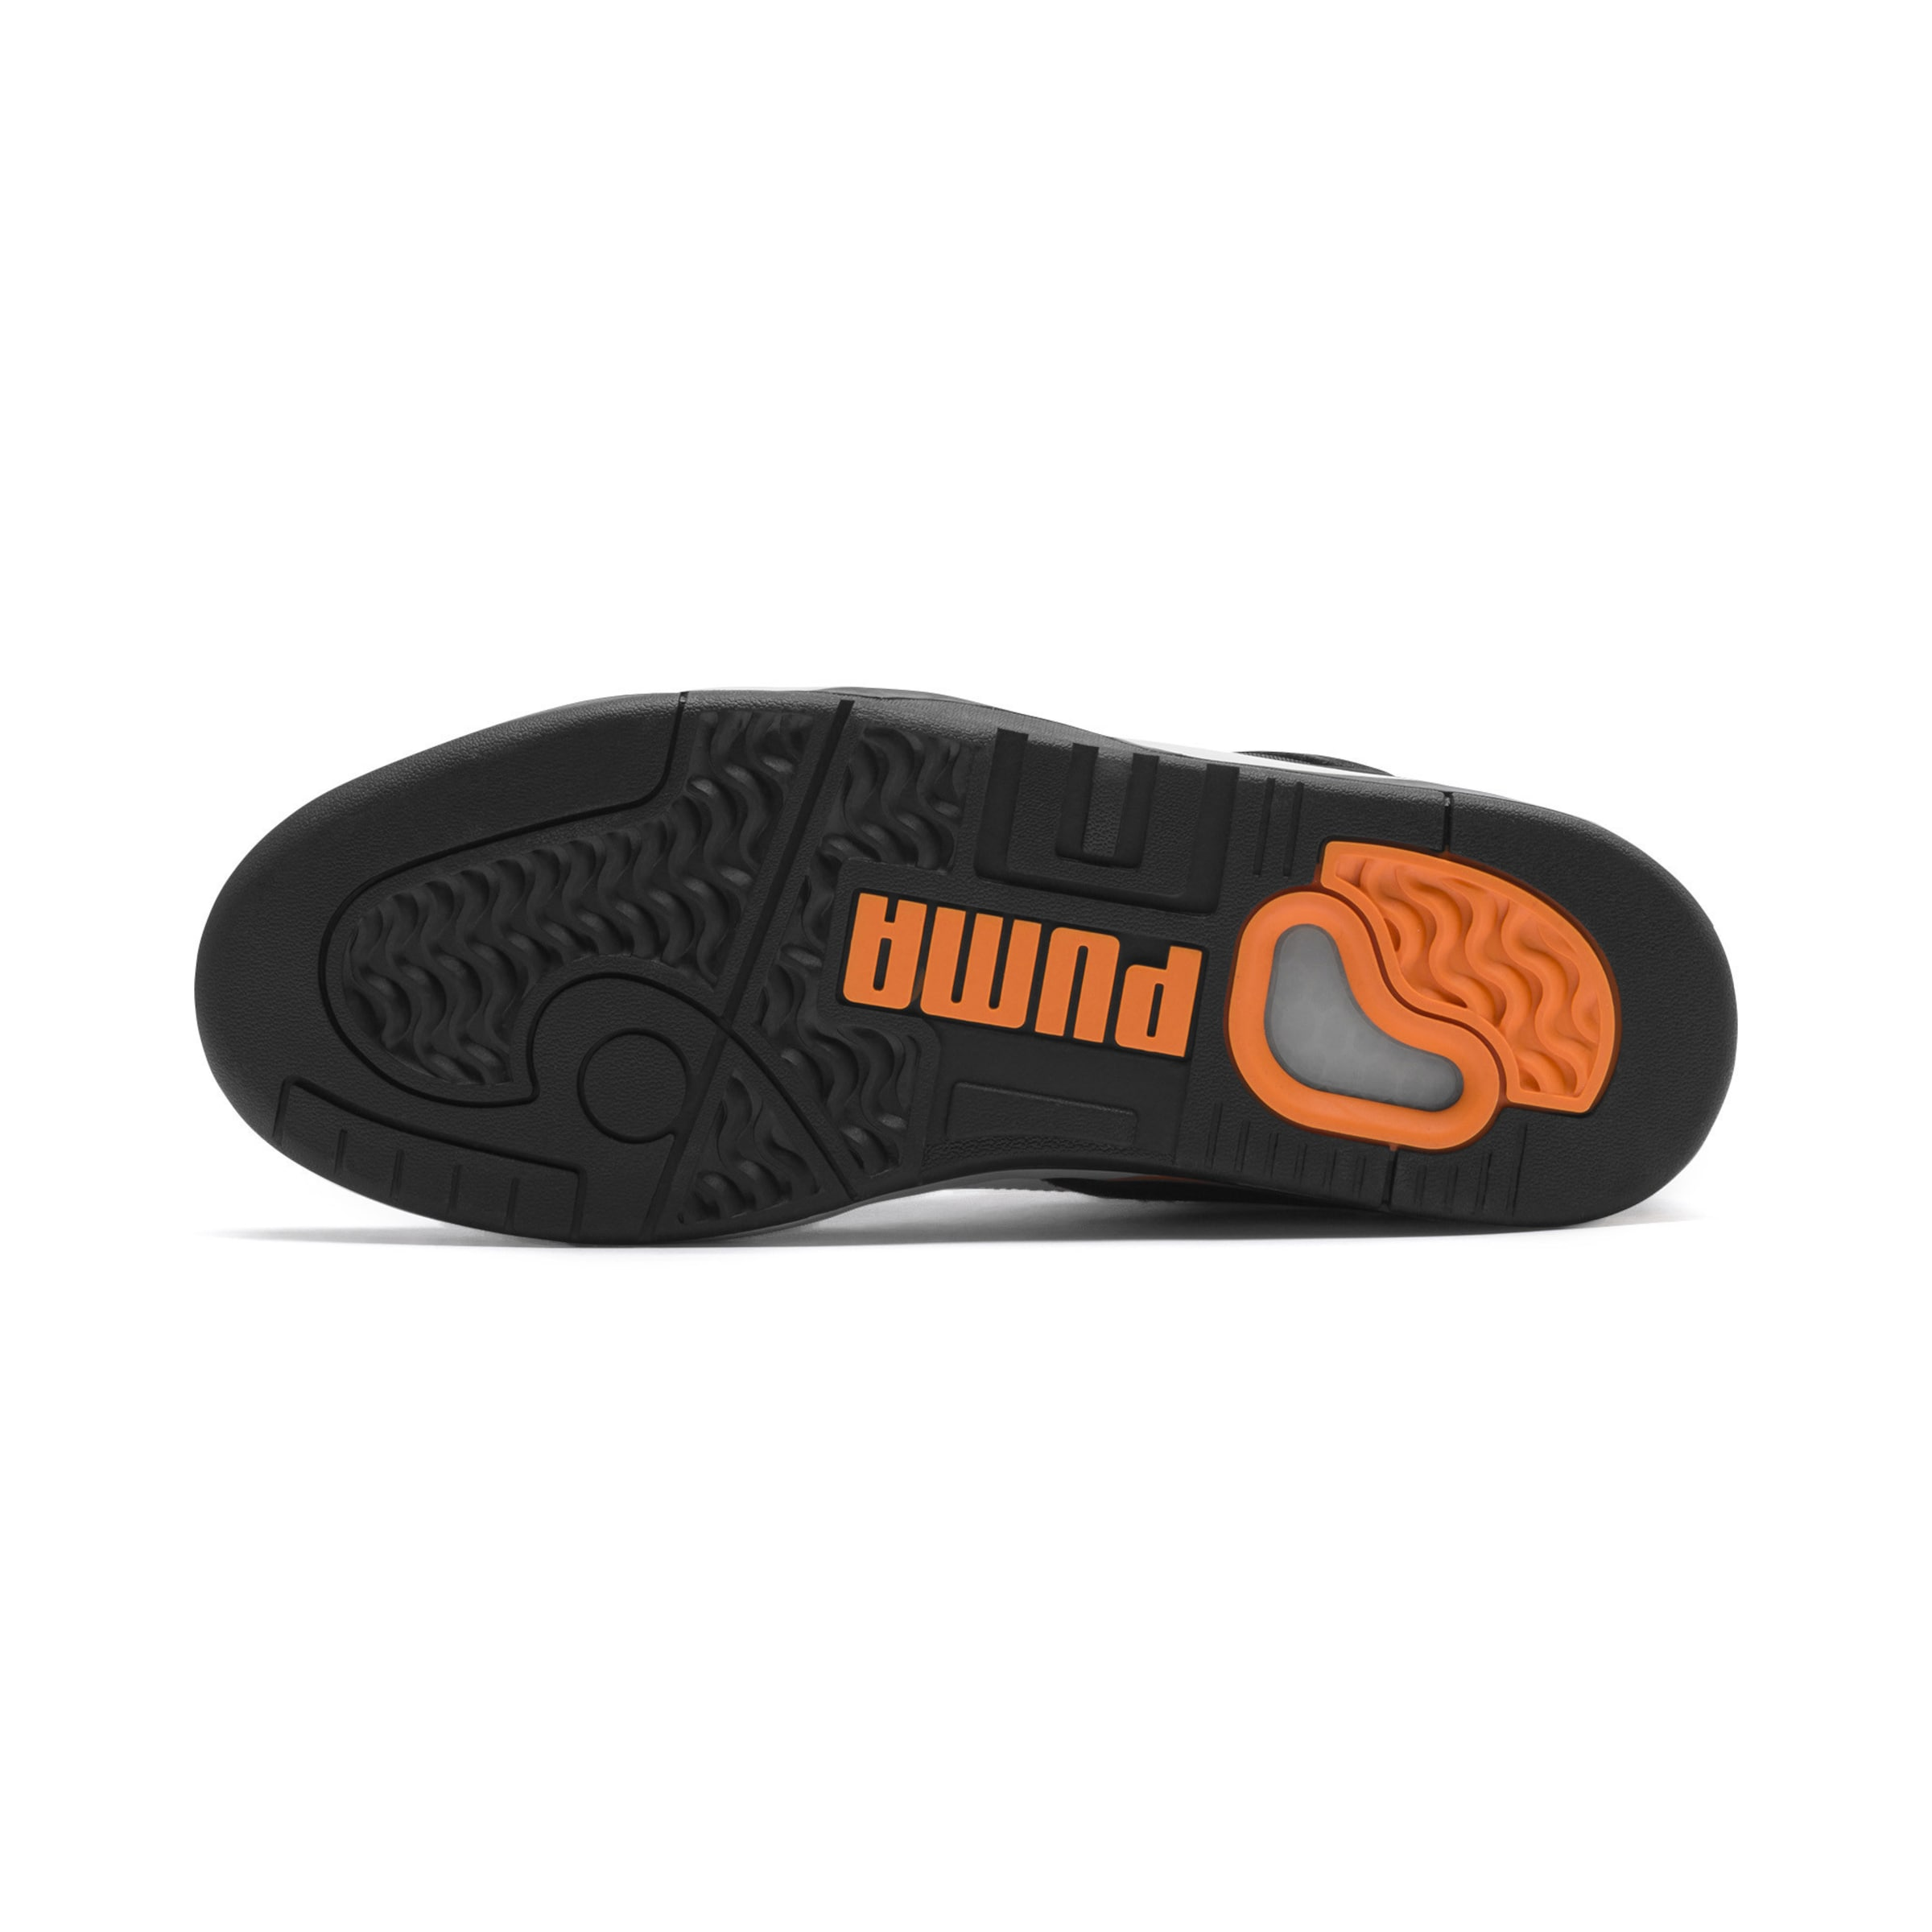 Guard' OrangeSchwarz Puma Weiß In Sneaker 'palace SzpMVU